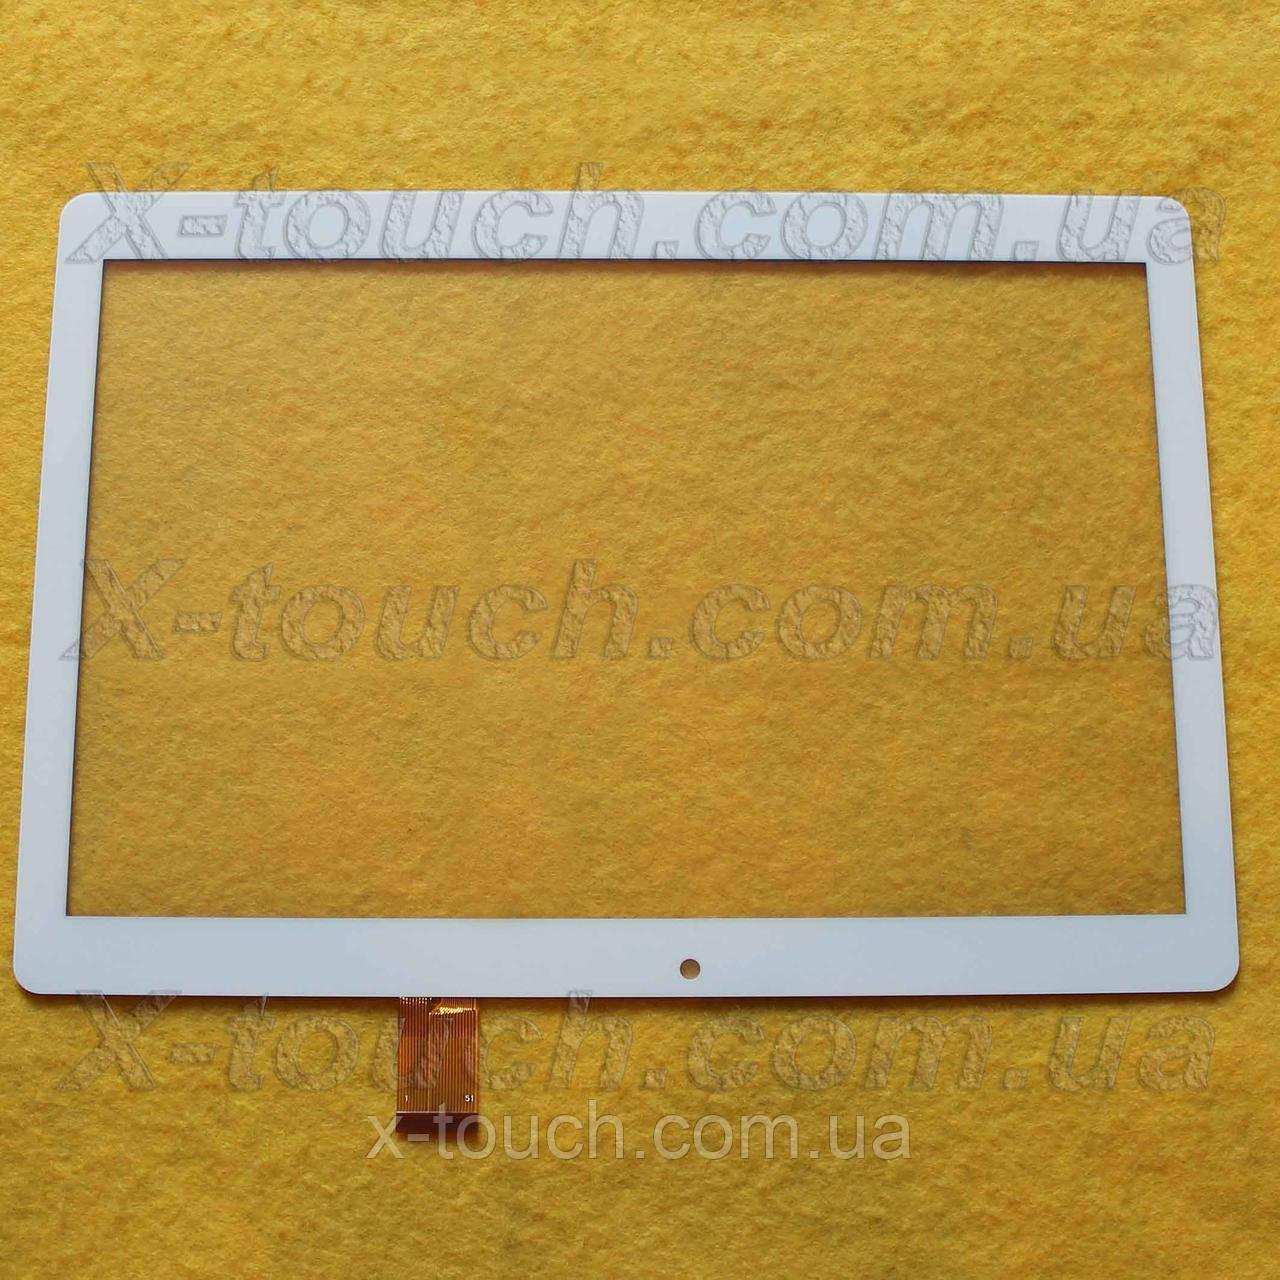 Тачскрин, сенсор Ginzzu GT-1050 для планшета, белого цвета.